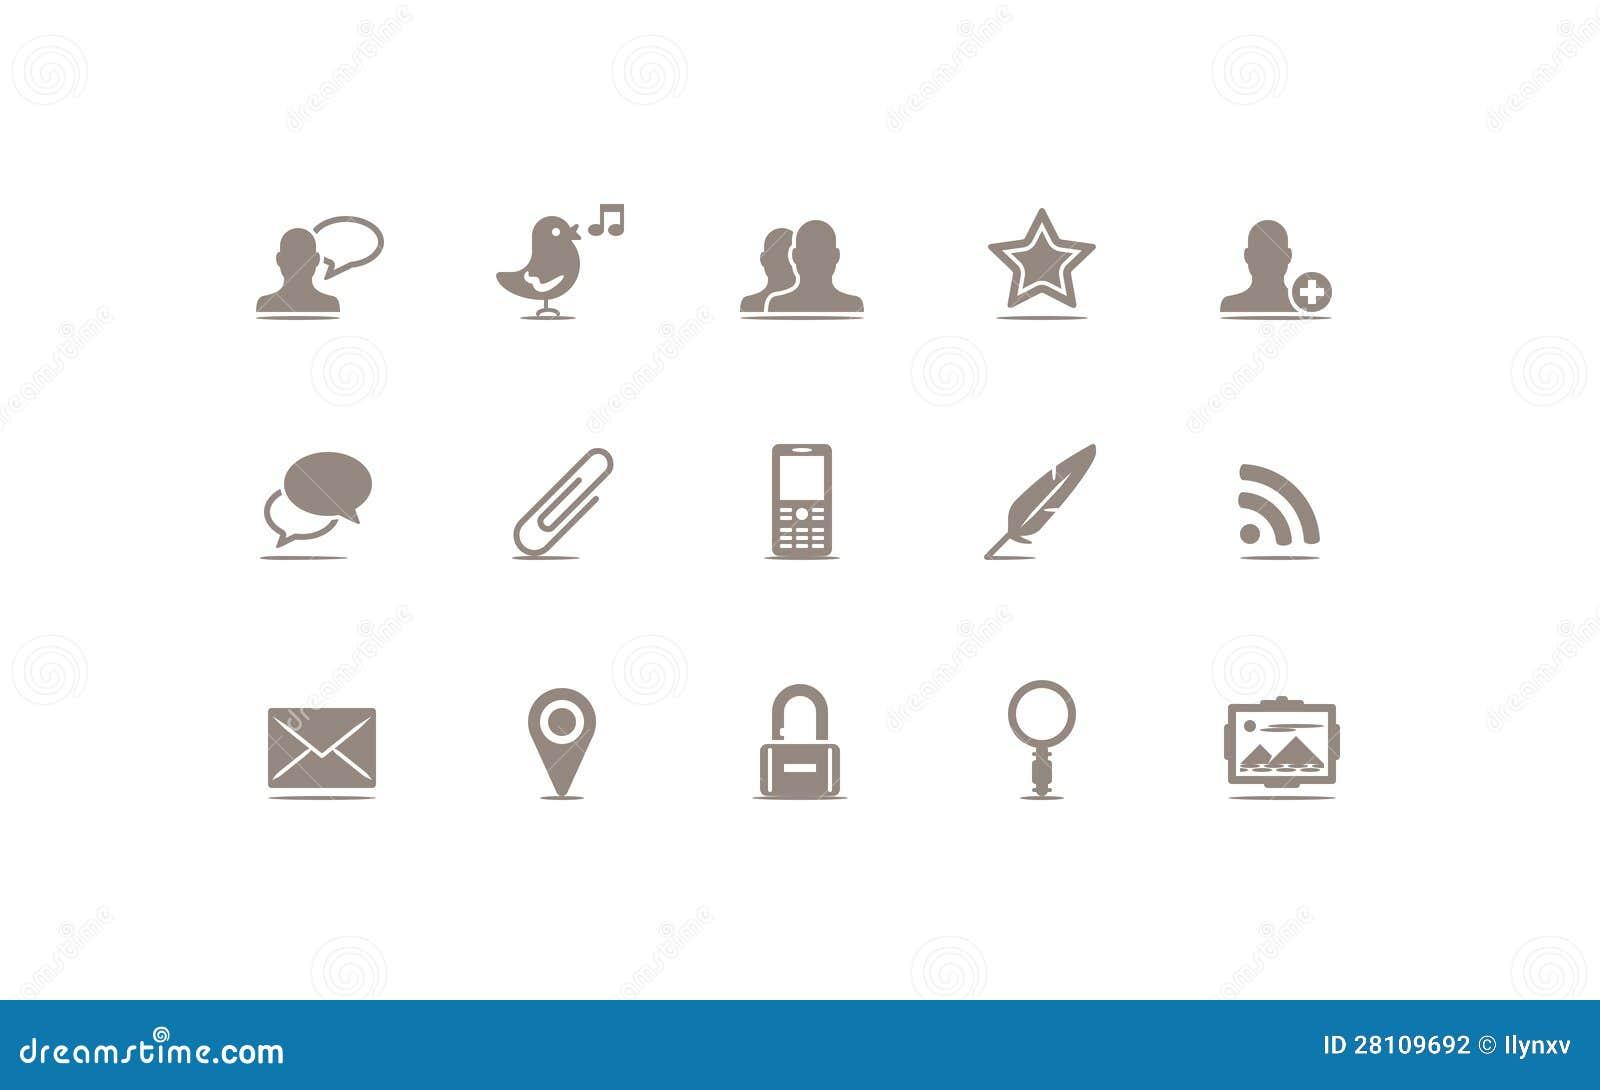 Sozialmedia und Blogikone